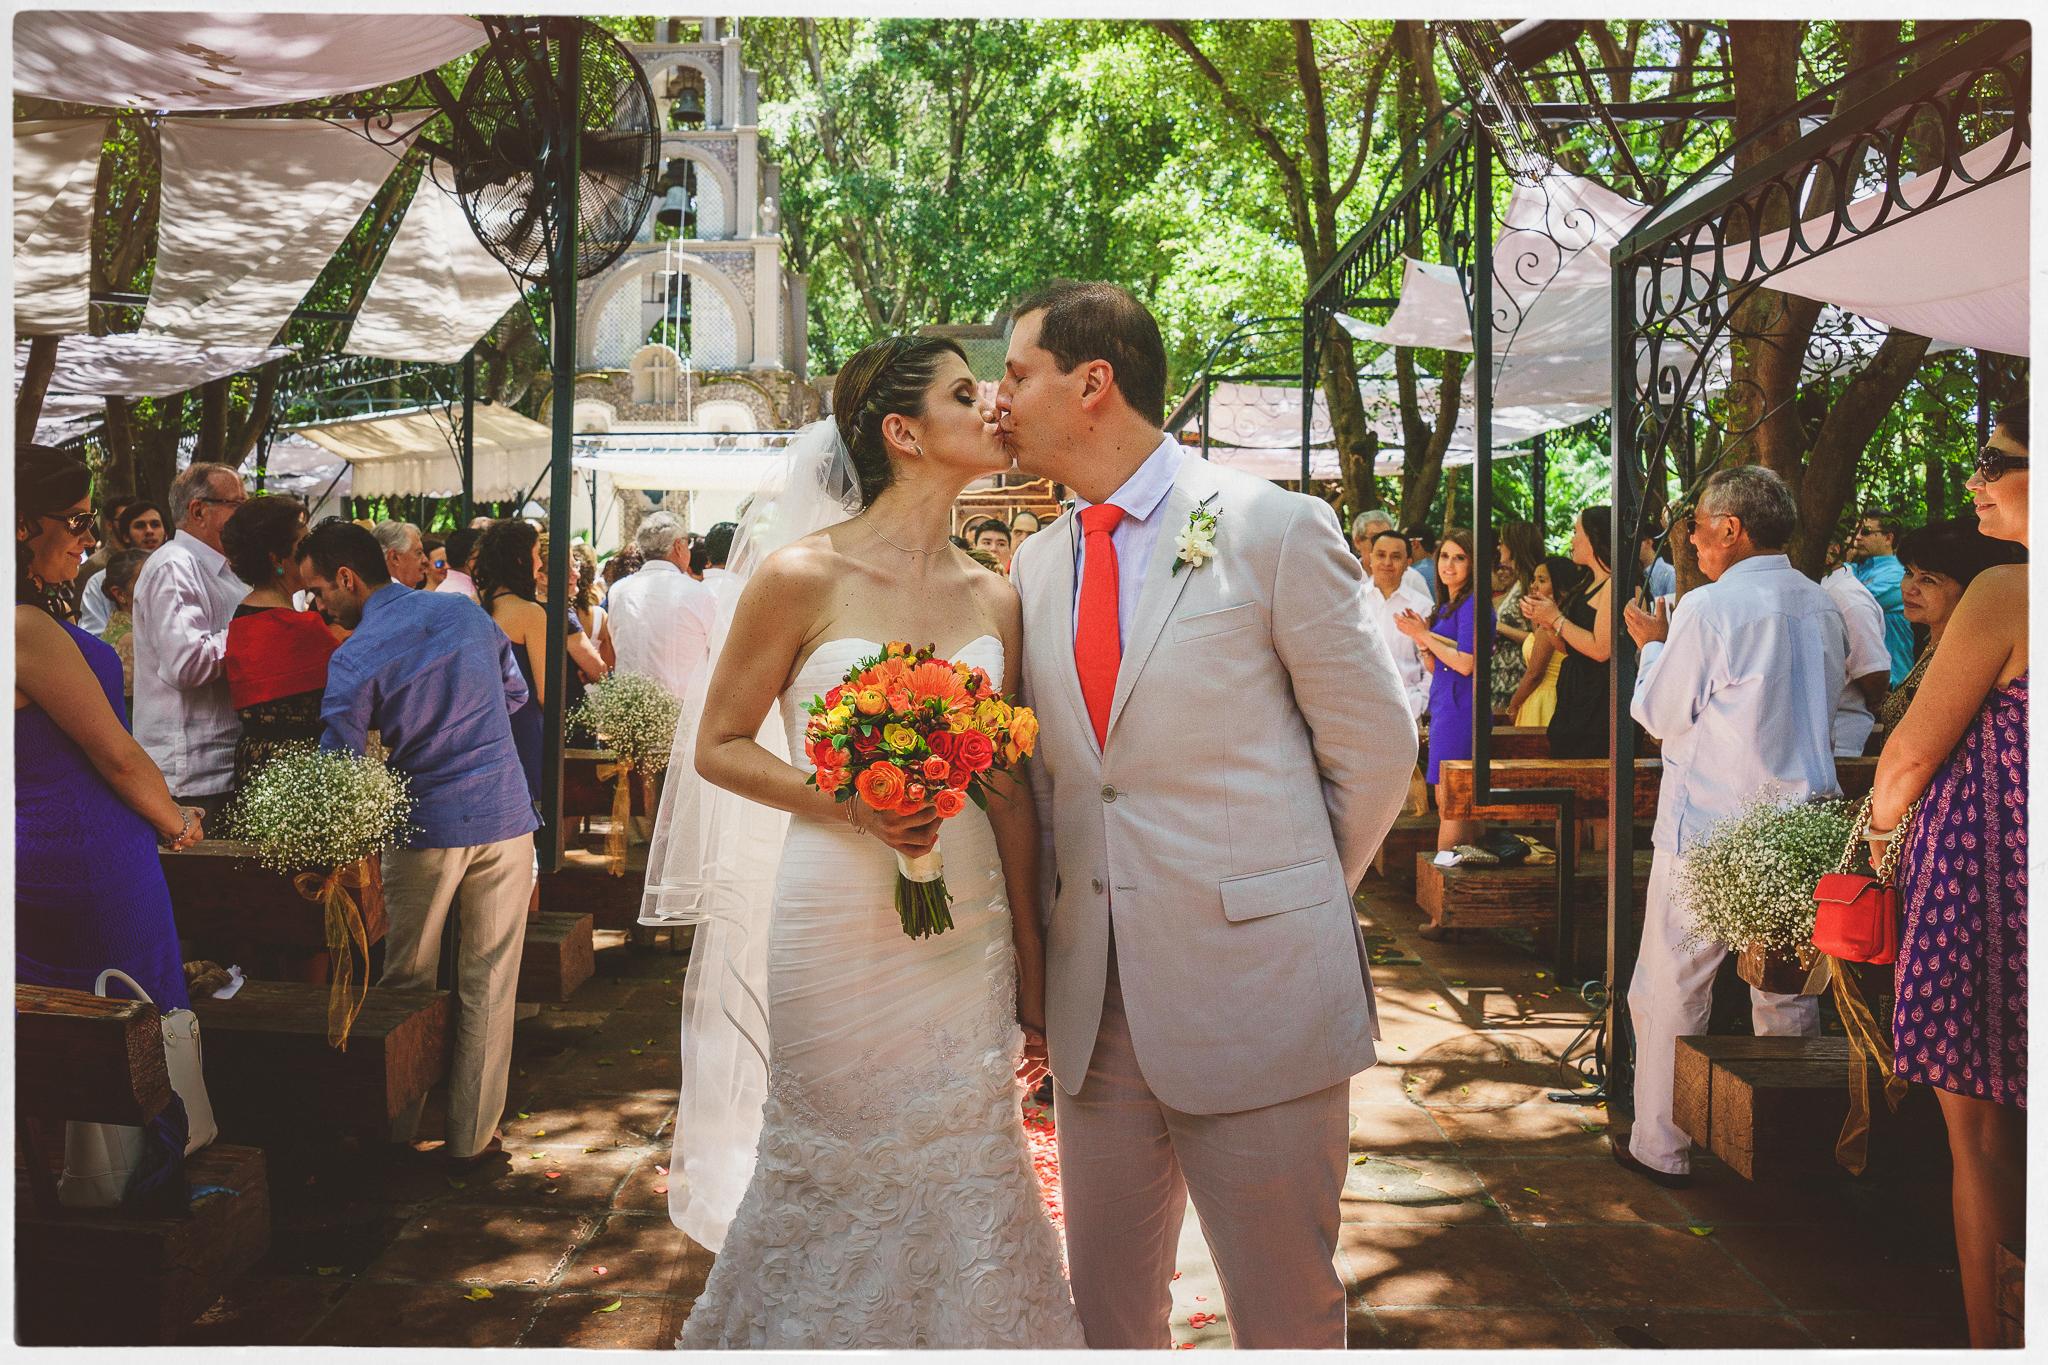 wedding-photography-mexico-quinta-rubelinas-43.jpg